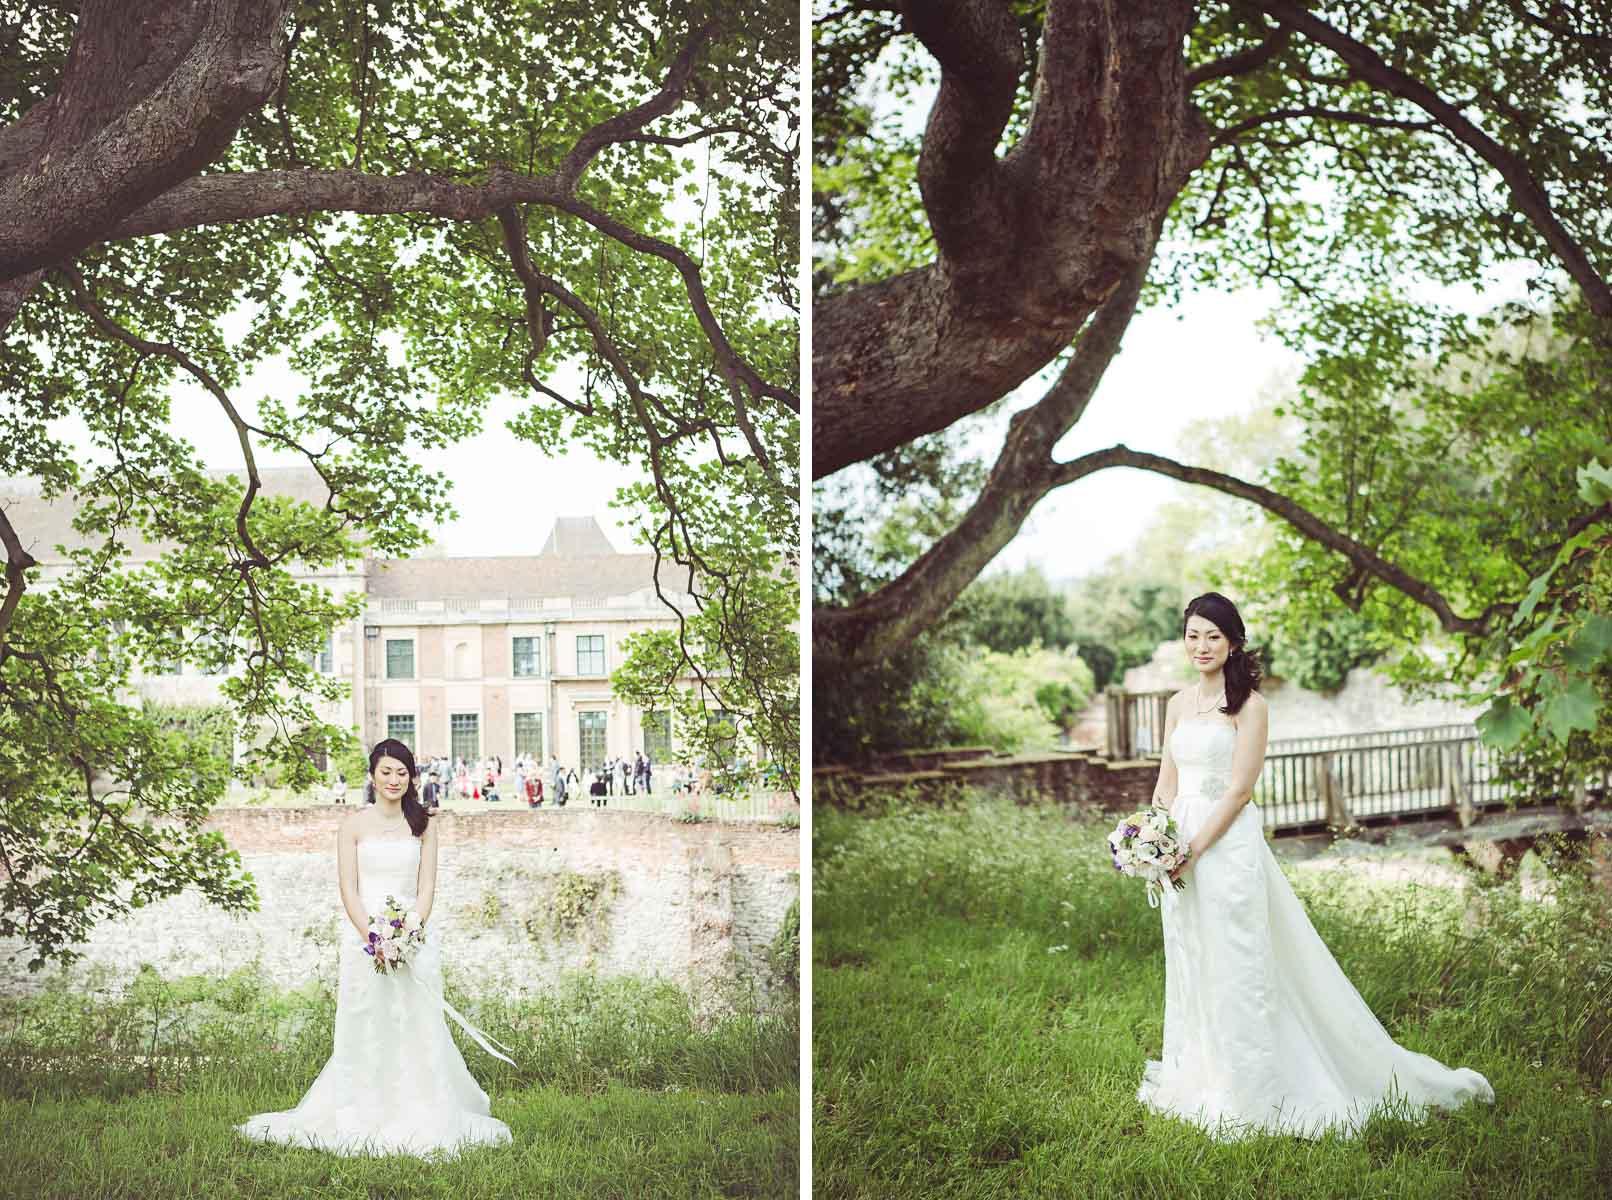 My Beautiful Bride photographs the bride at Eltham Palace